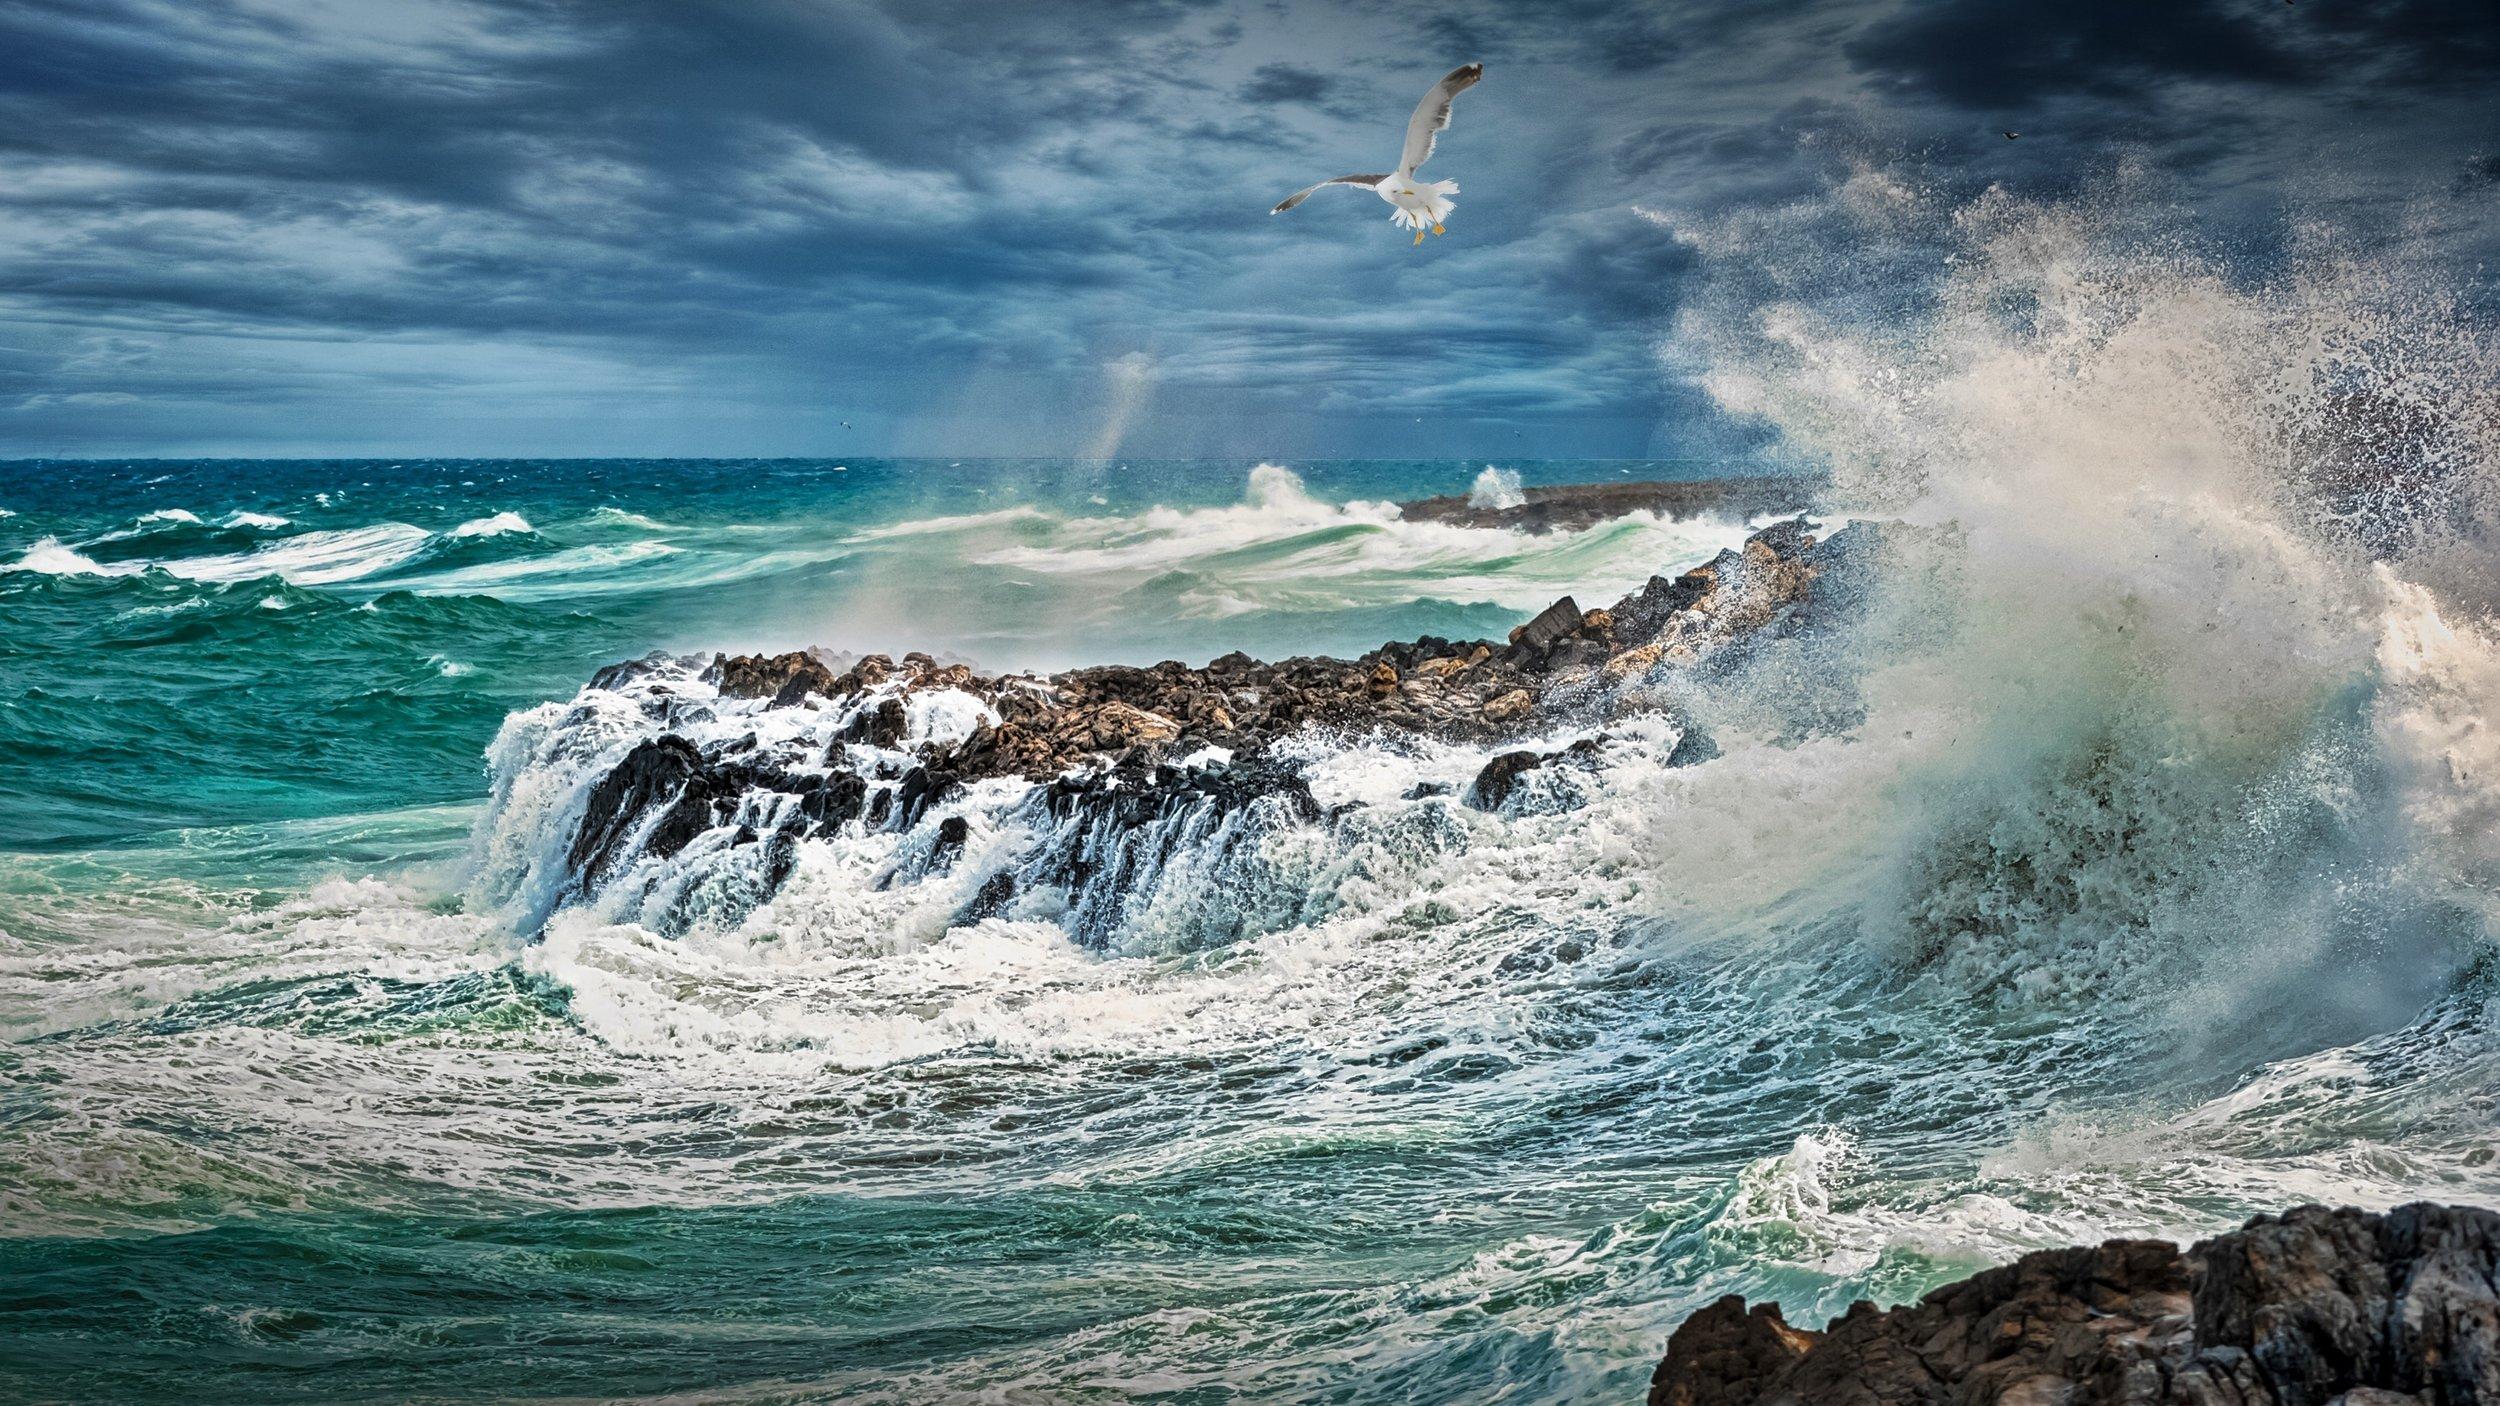 beach-by-the-sea-cloudy-skies-801857.jpg